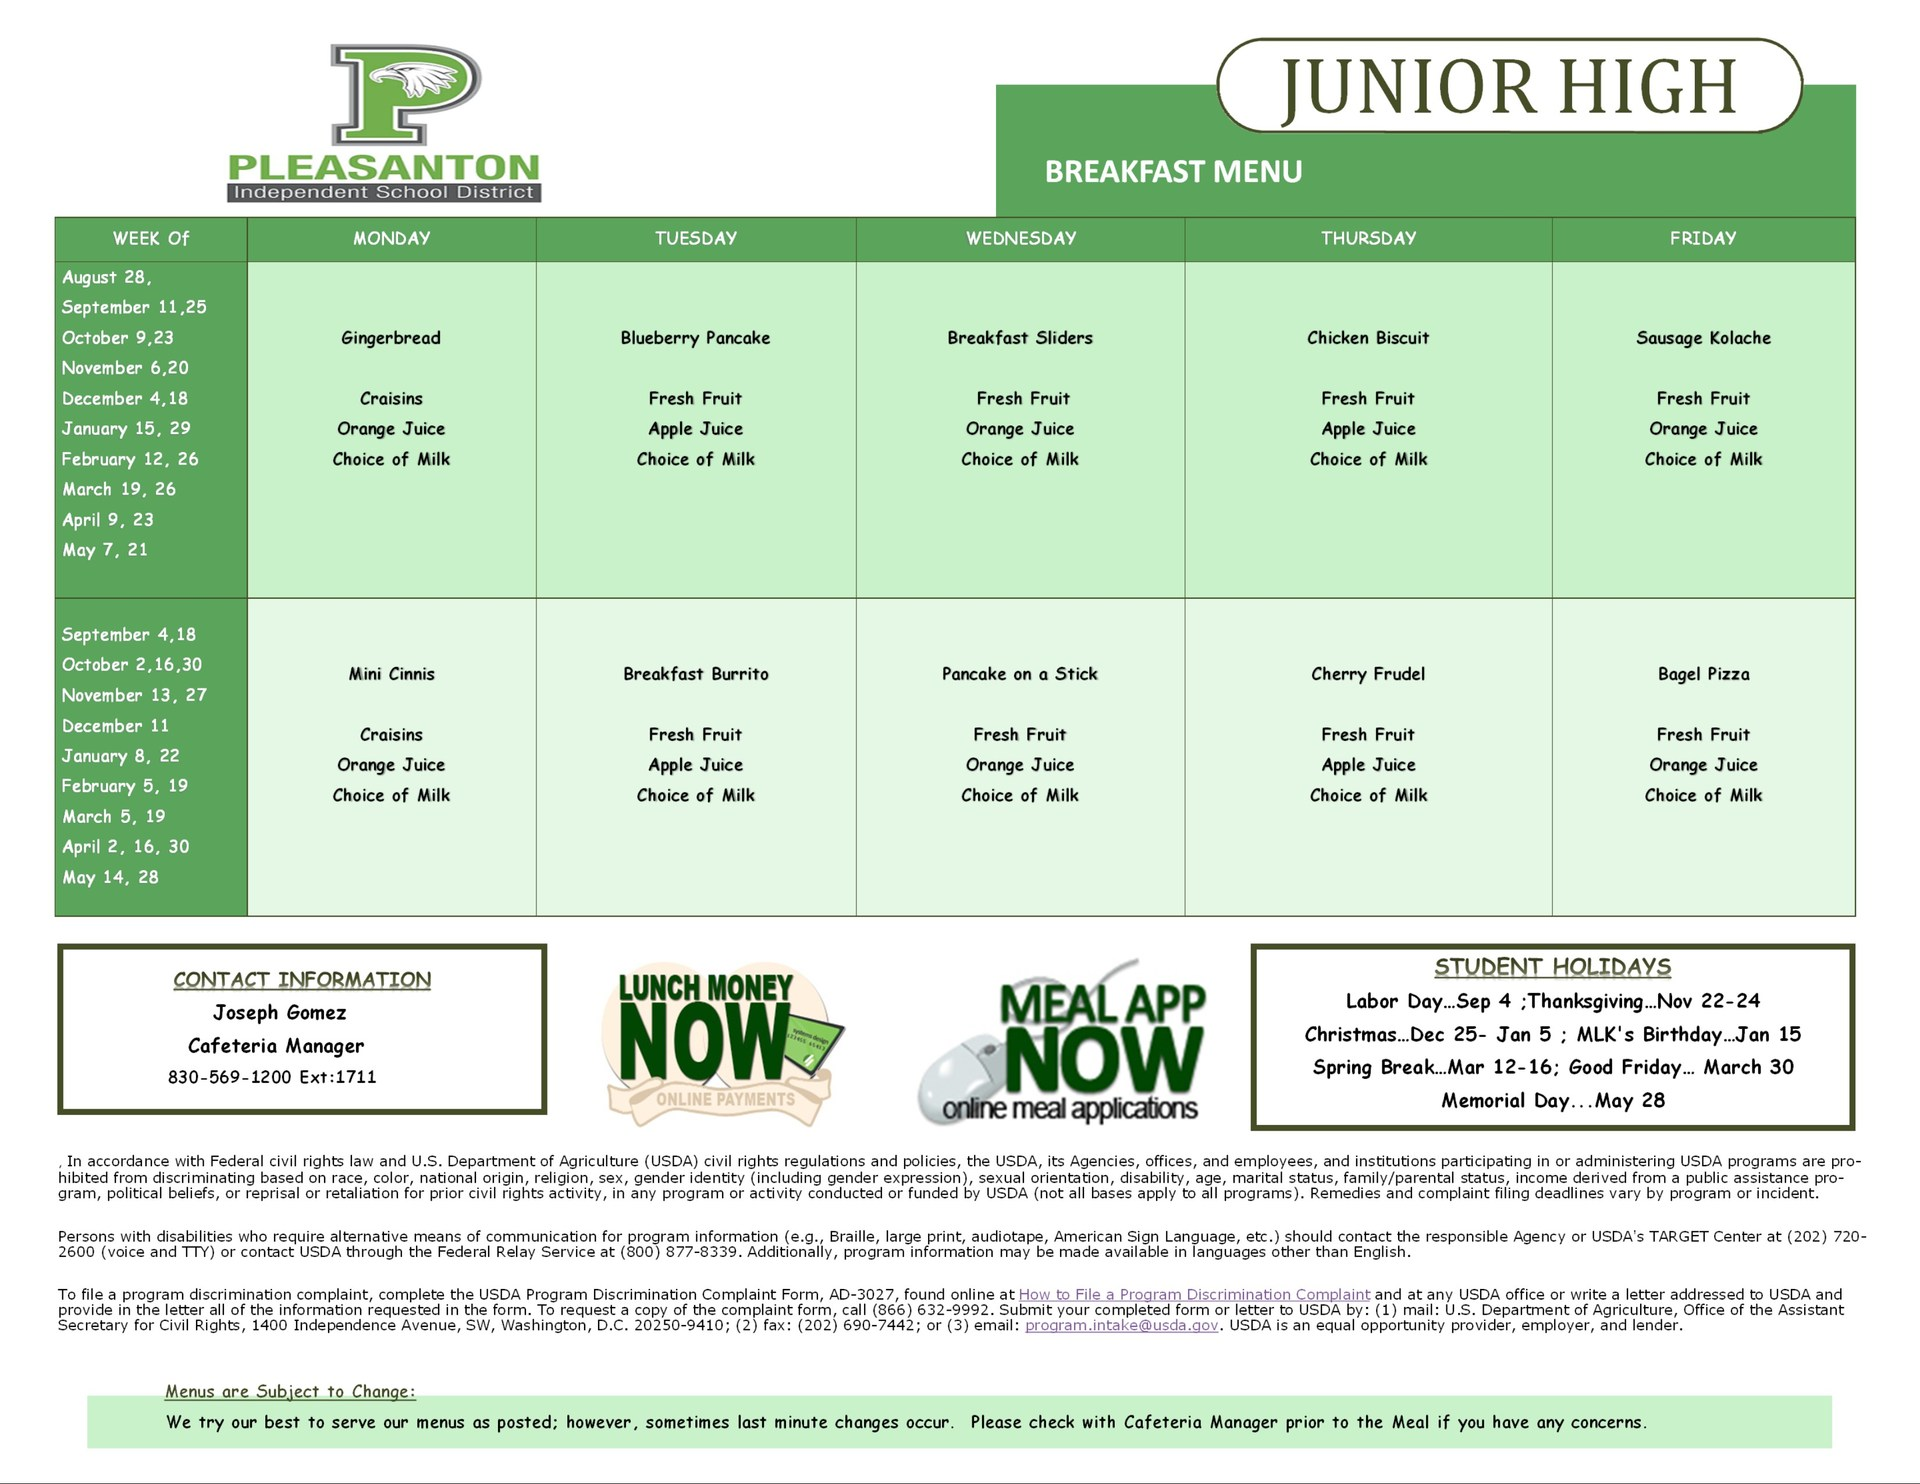 Junior high breakfast menu